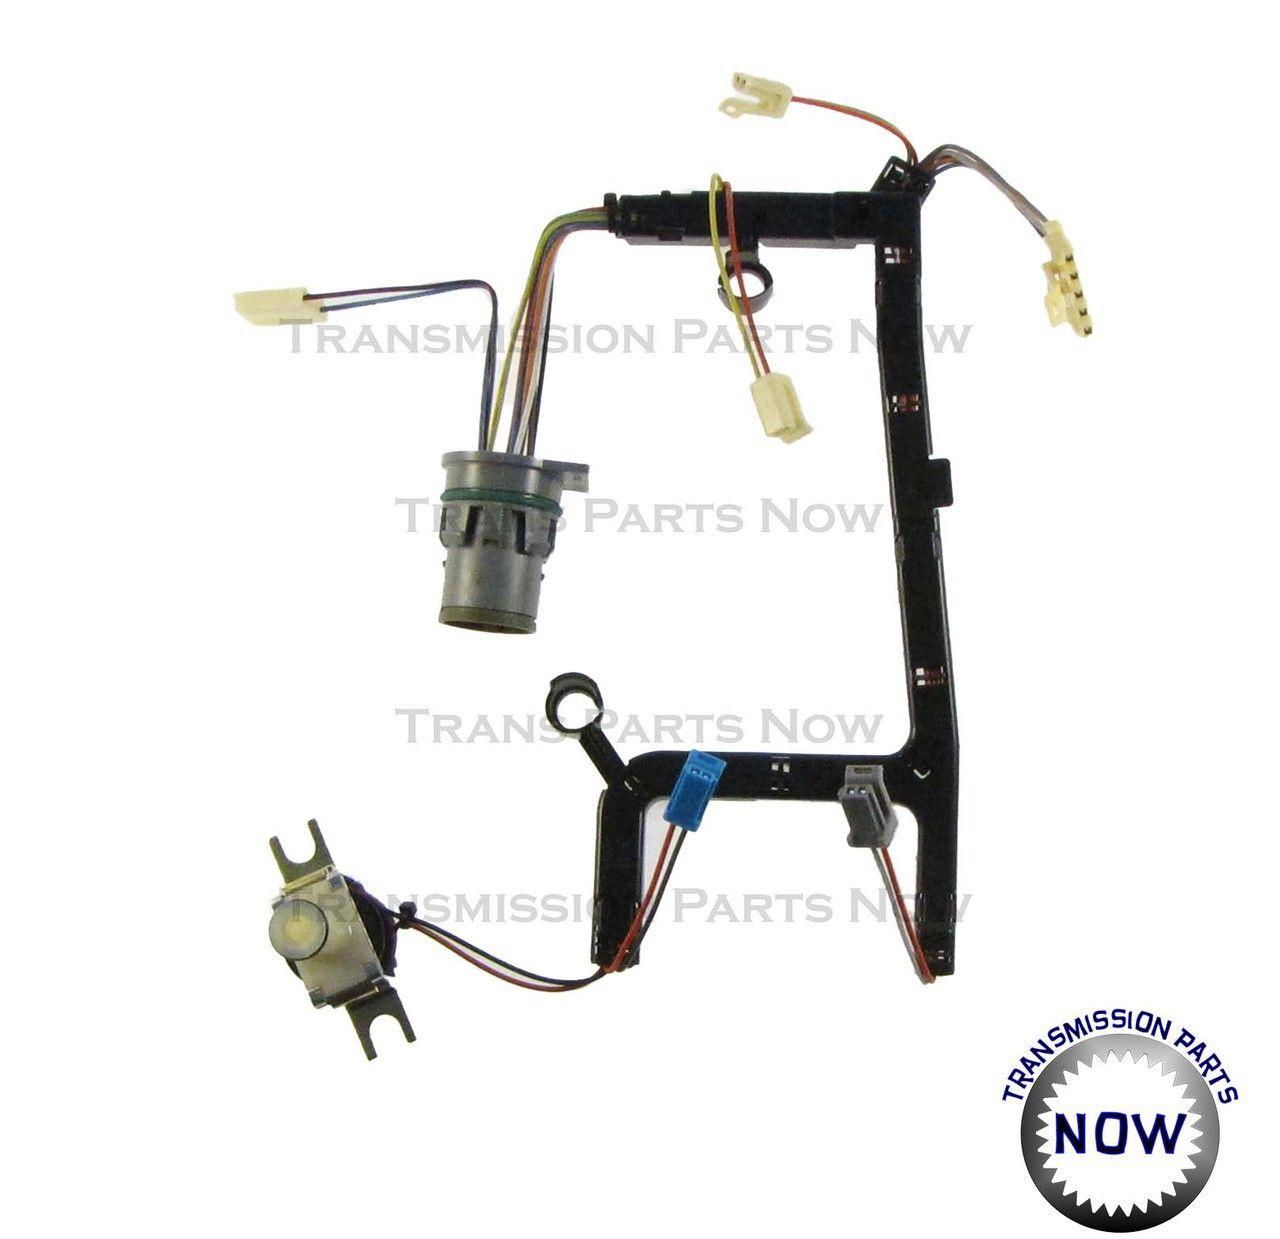 83585bb895740e59878dc74064e6eb15 4l60e 4l65e internal wire harness, tcc solenoid 1993 2002 TCC Solenoid Symptoms at eliteediting.co